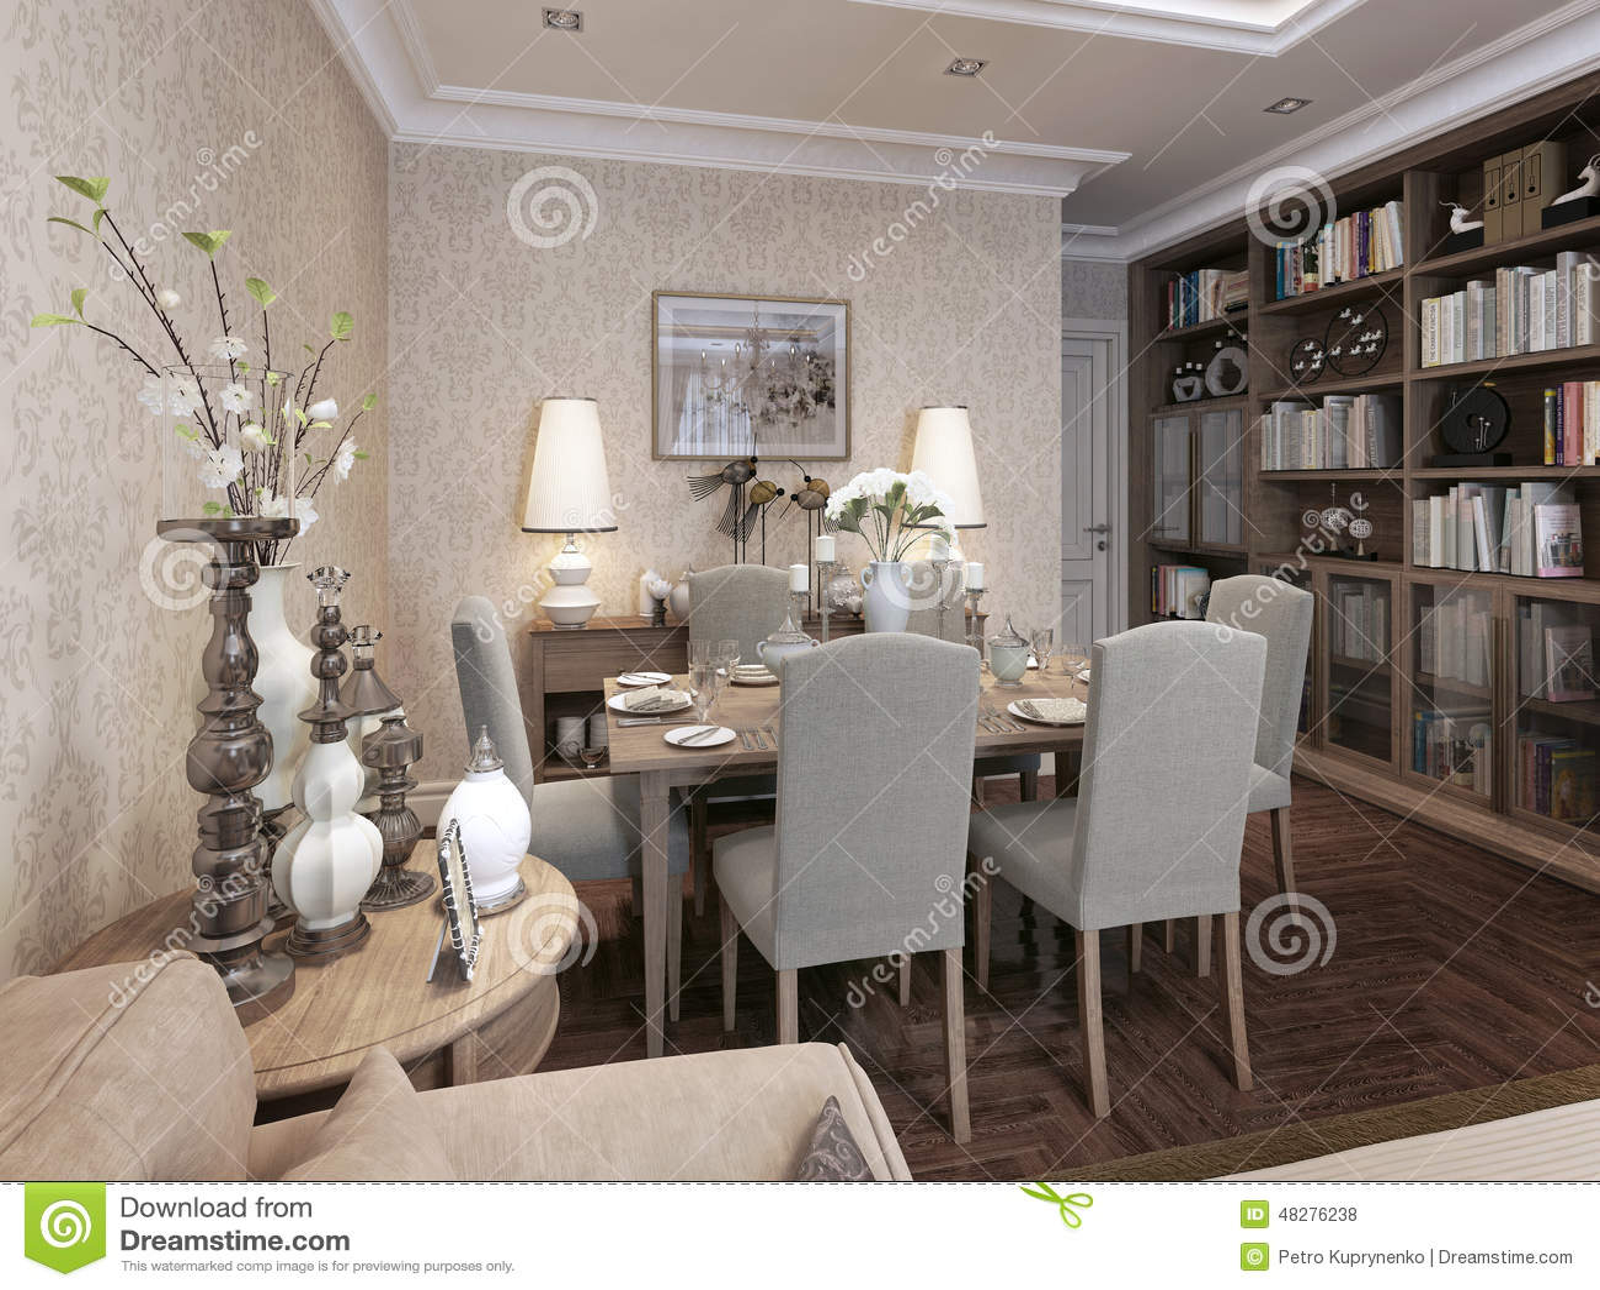 Stile moderno della sala da pranzo illustrazione di stock illustrazione 48276238 - Lampadario sala da pranzo moderna ...